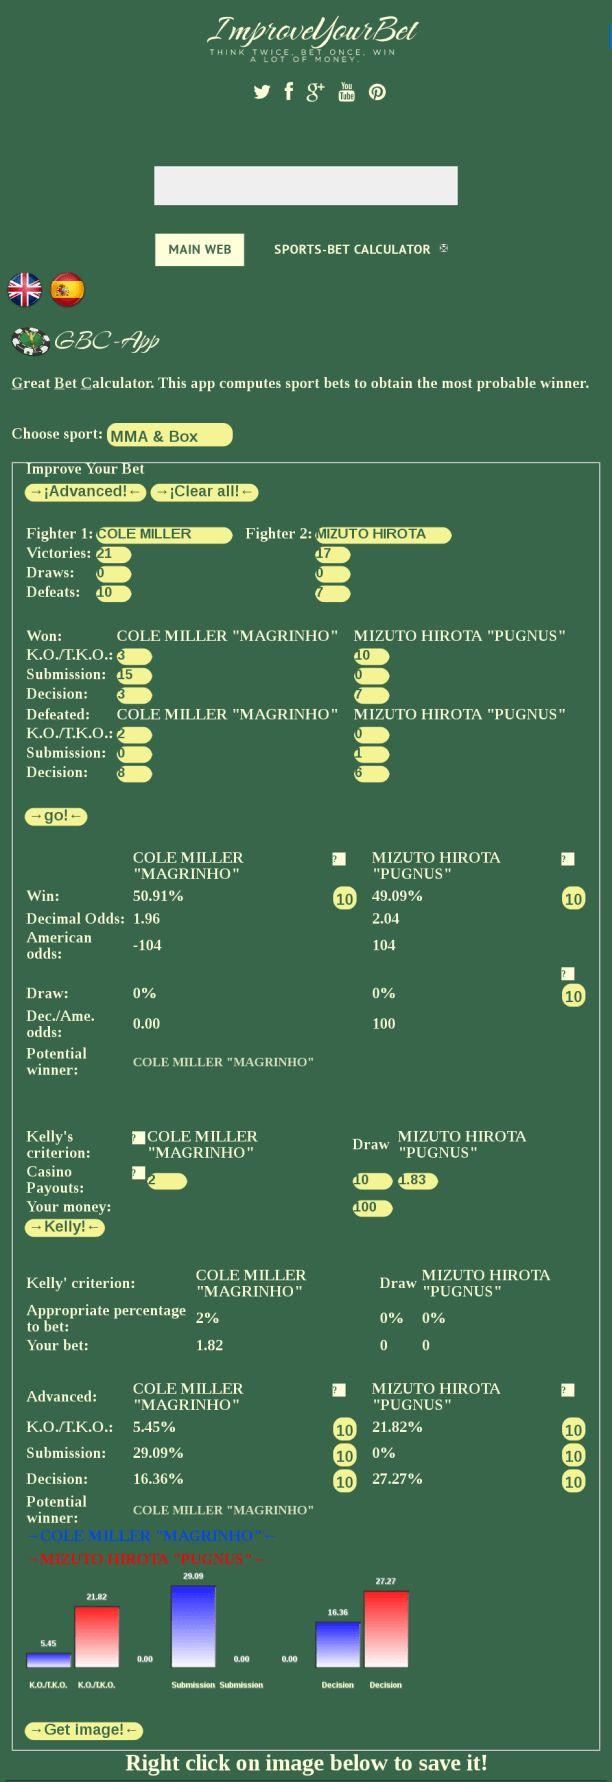 ufc-on-fox-22-forecast-and-predictions-cole-miller-vs-mizuto-hirota